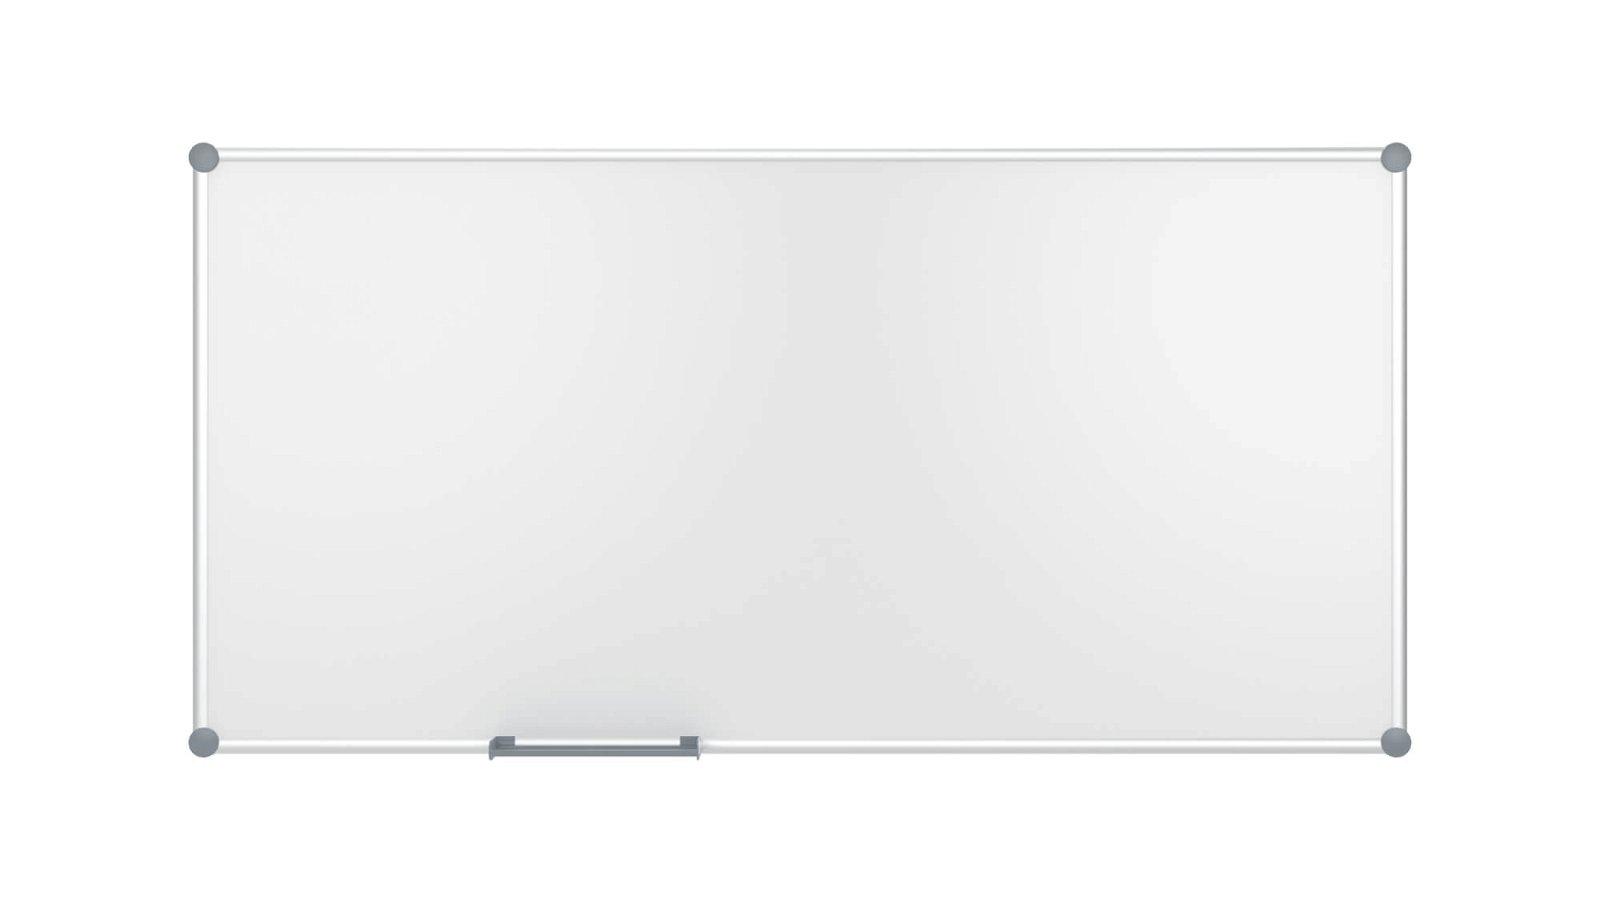 Whiteboard 2000 MAULpro, 90x180 cm, grau